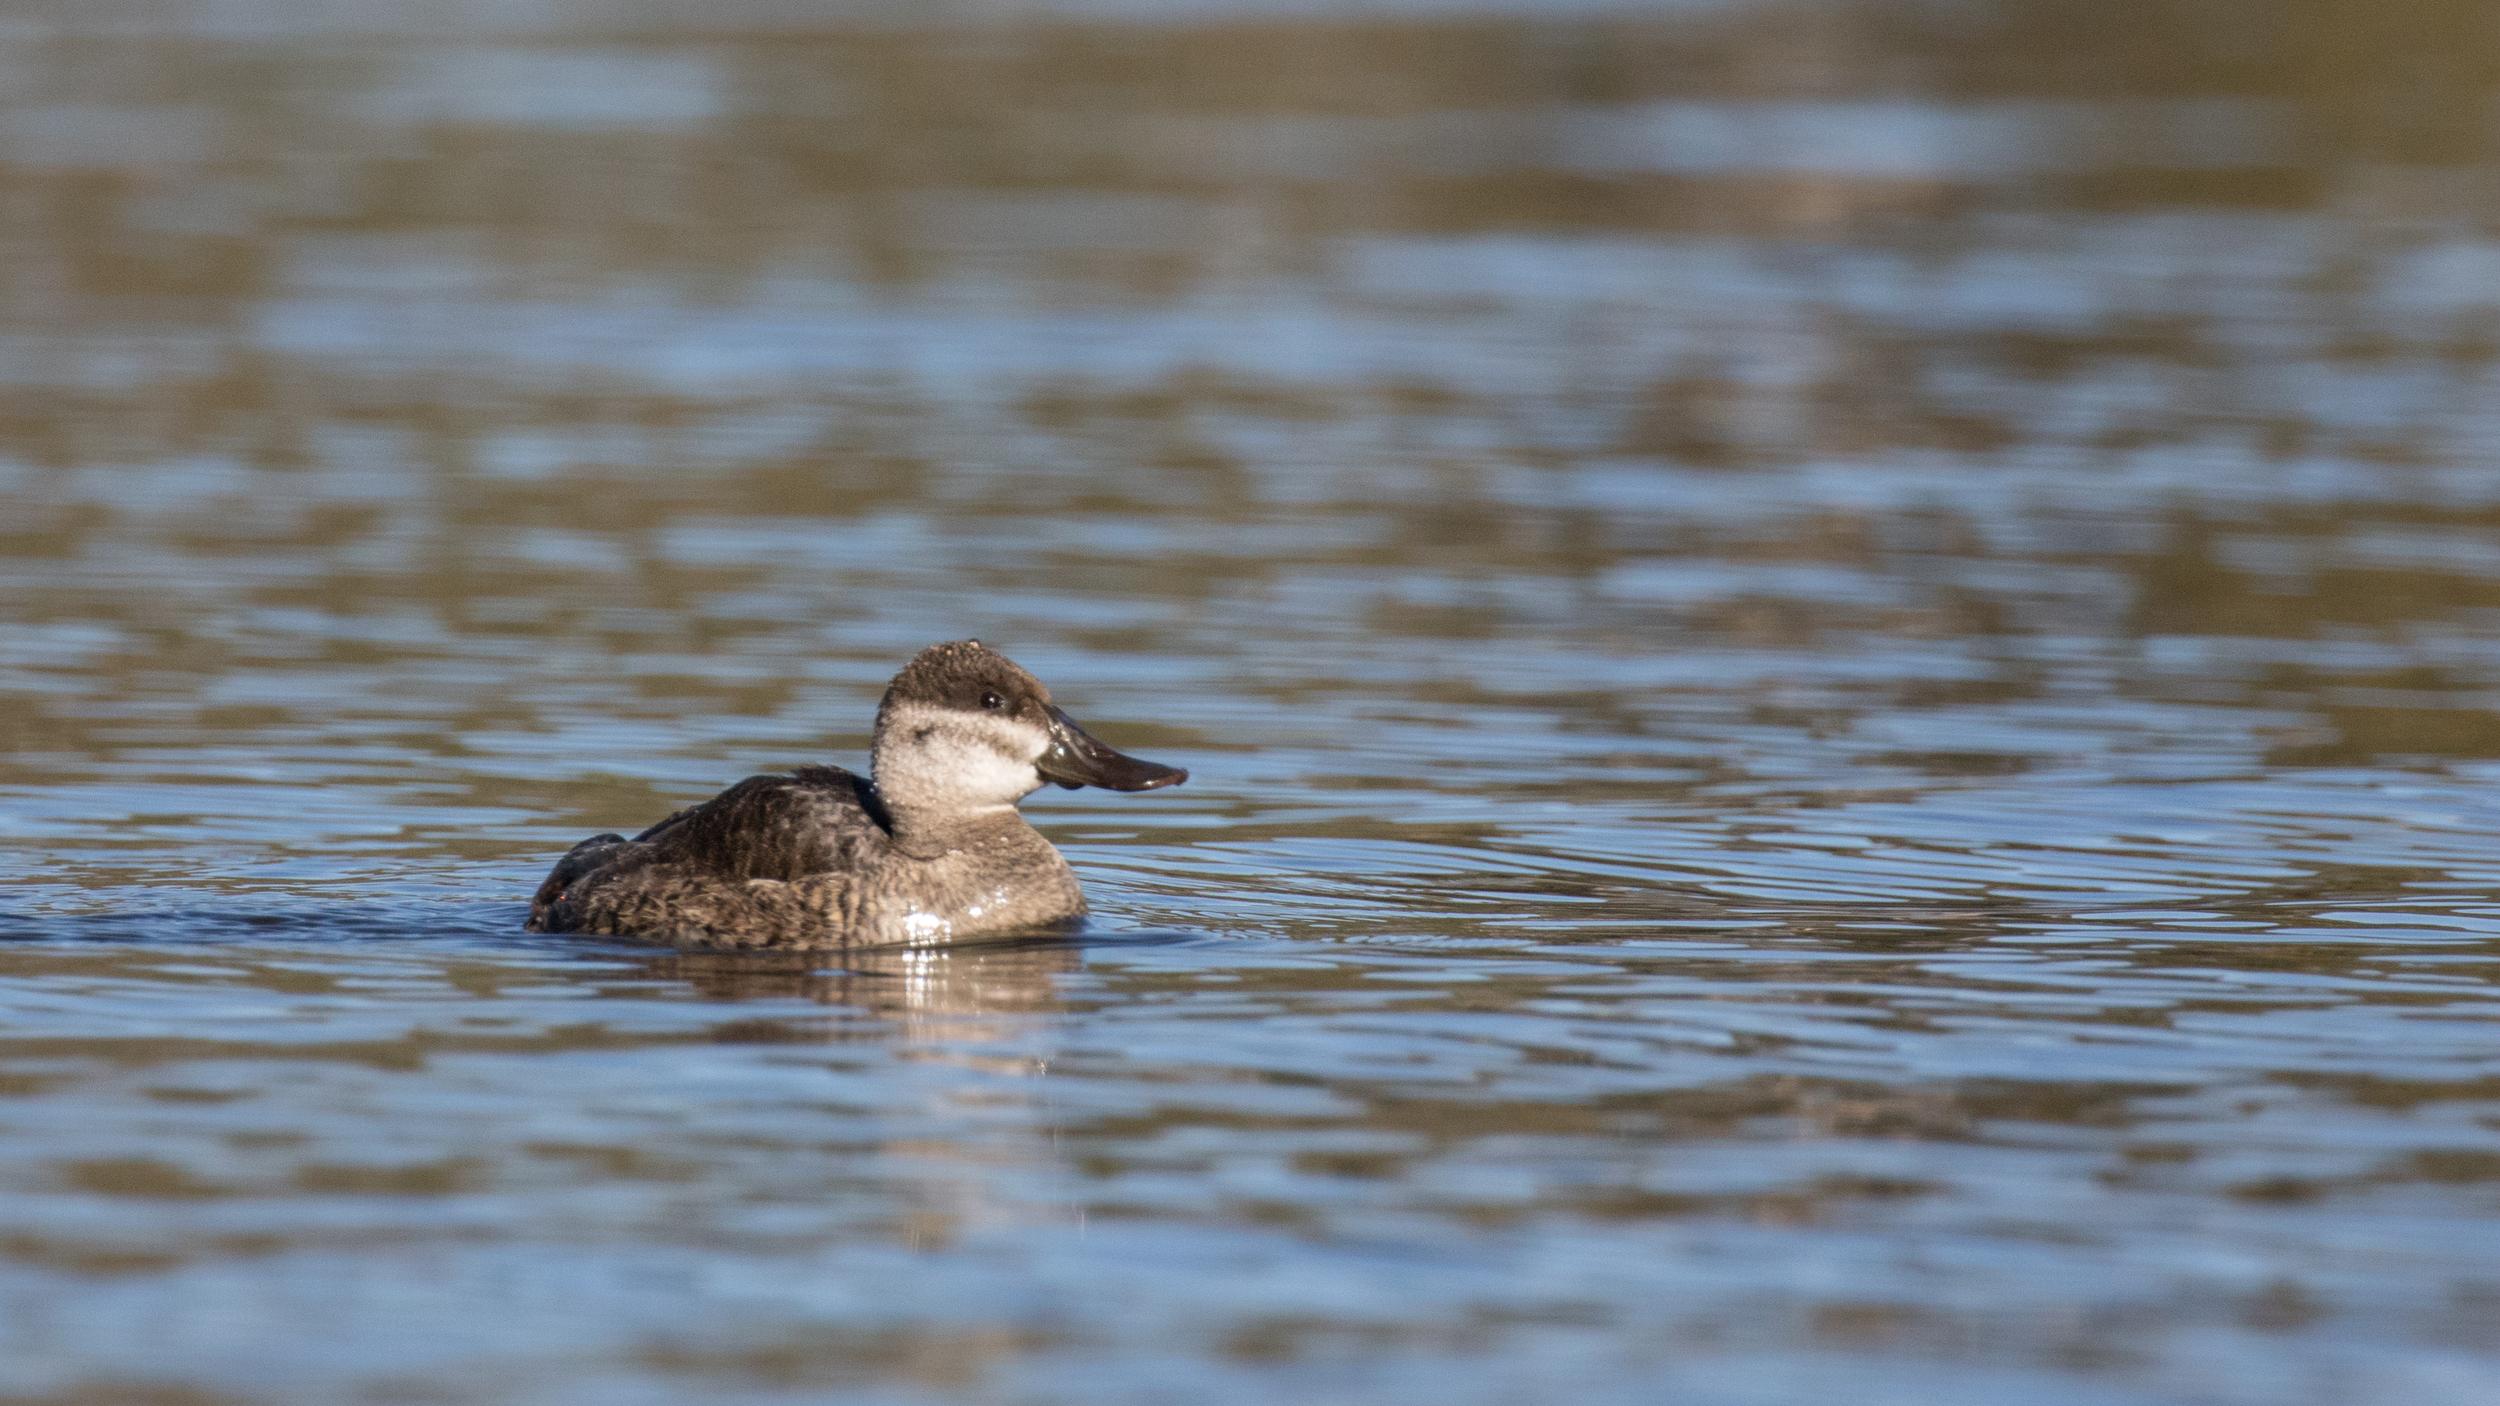 Ruddy Duck (Oxyura jamaicensis)at the Laguna Niguel Regional Park, California.December 2015. Not baited. Not called in.